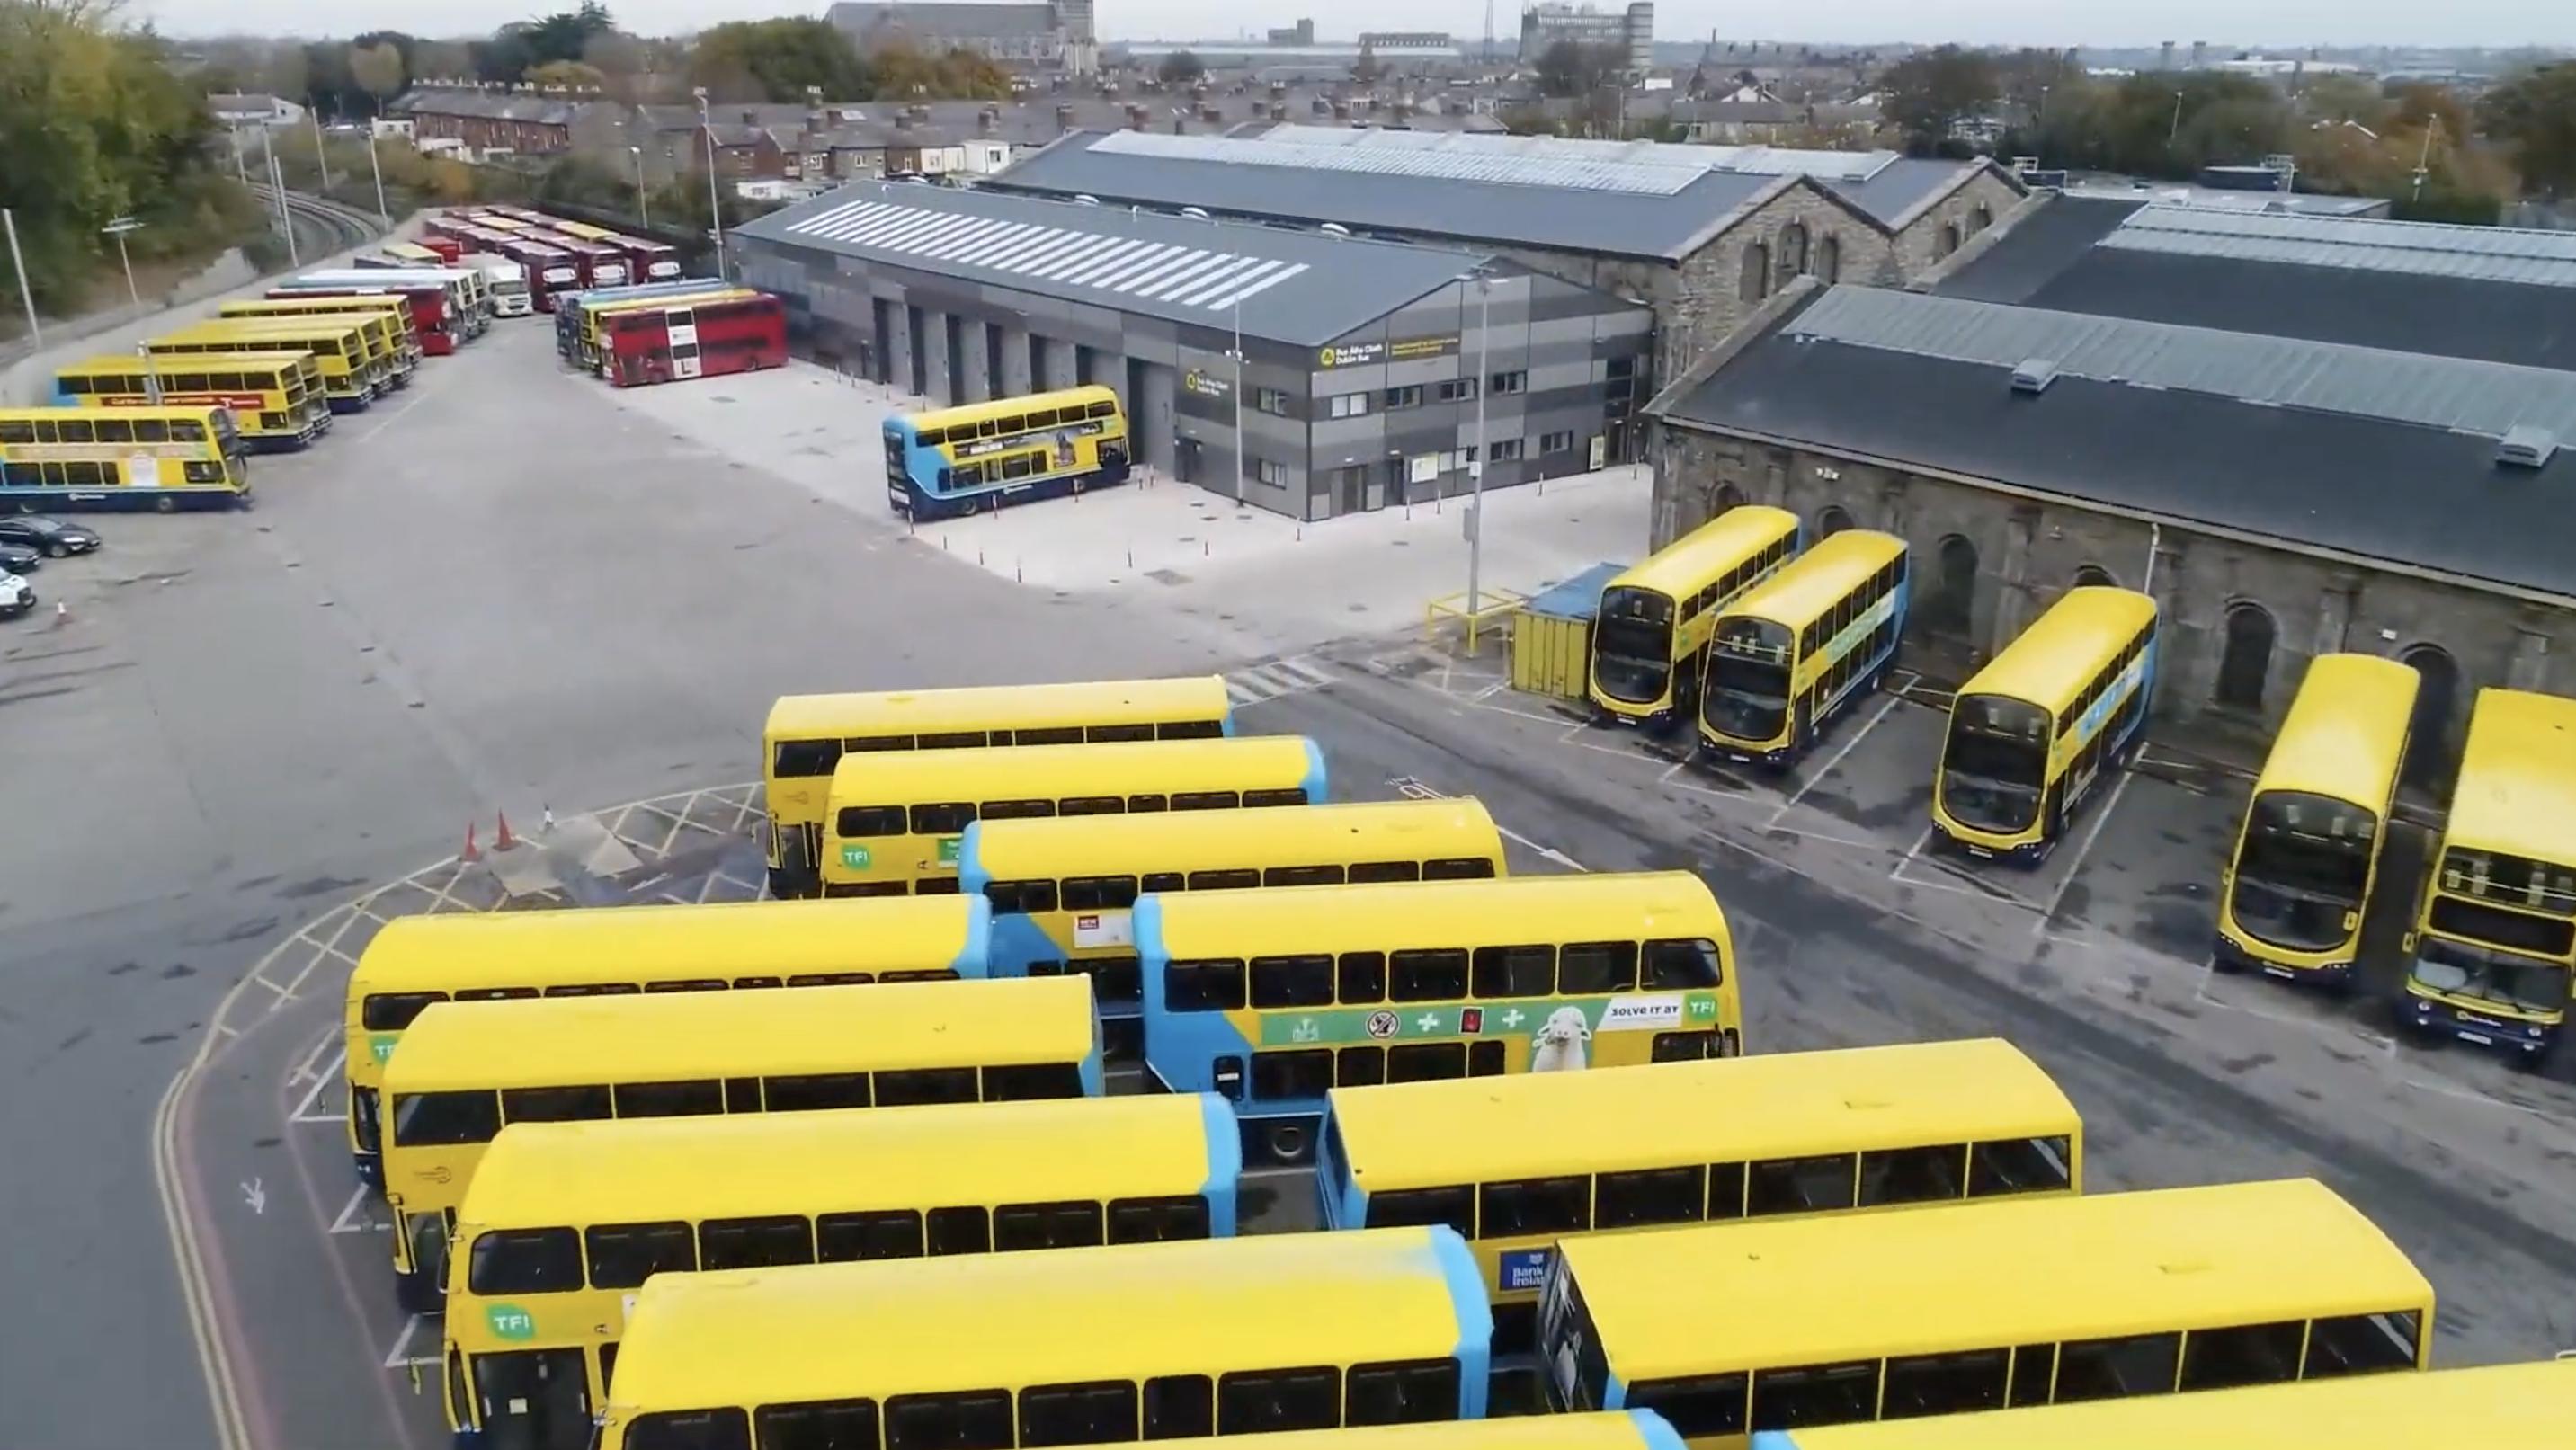 Dublin bus broadstone depot